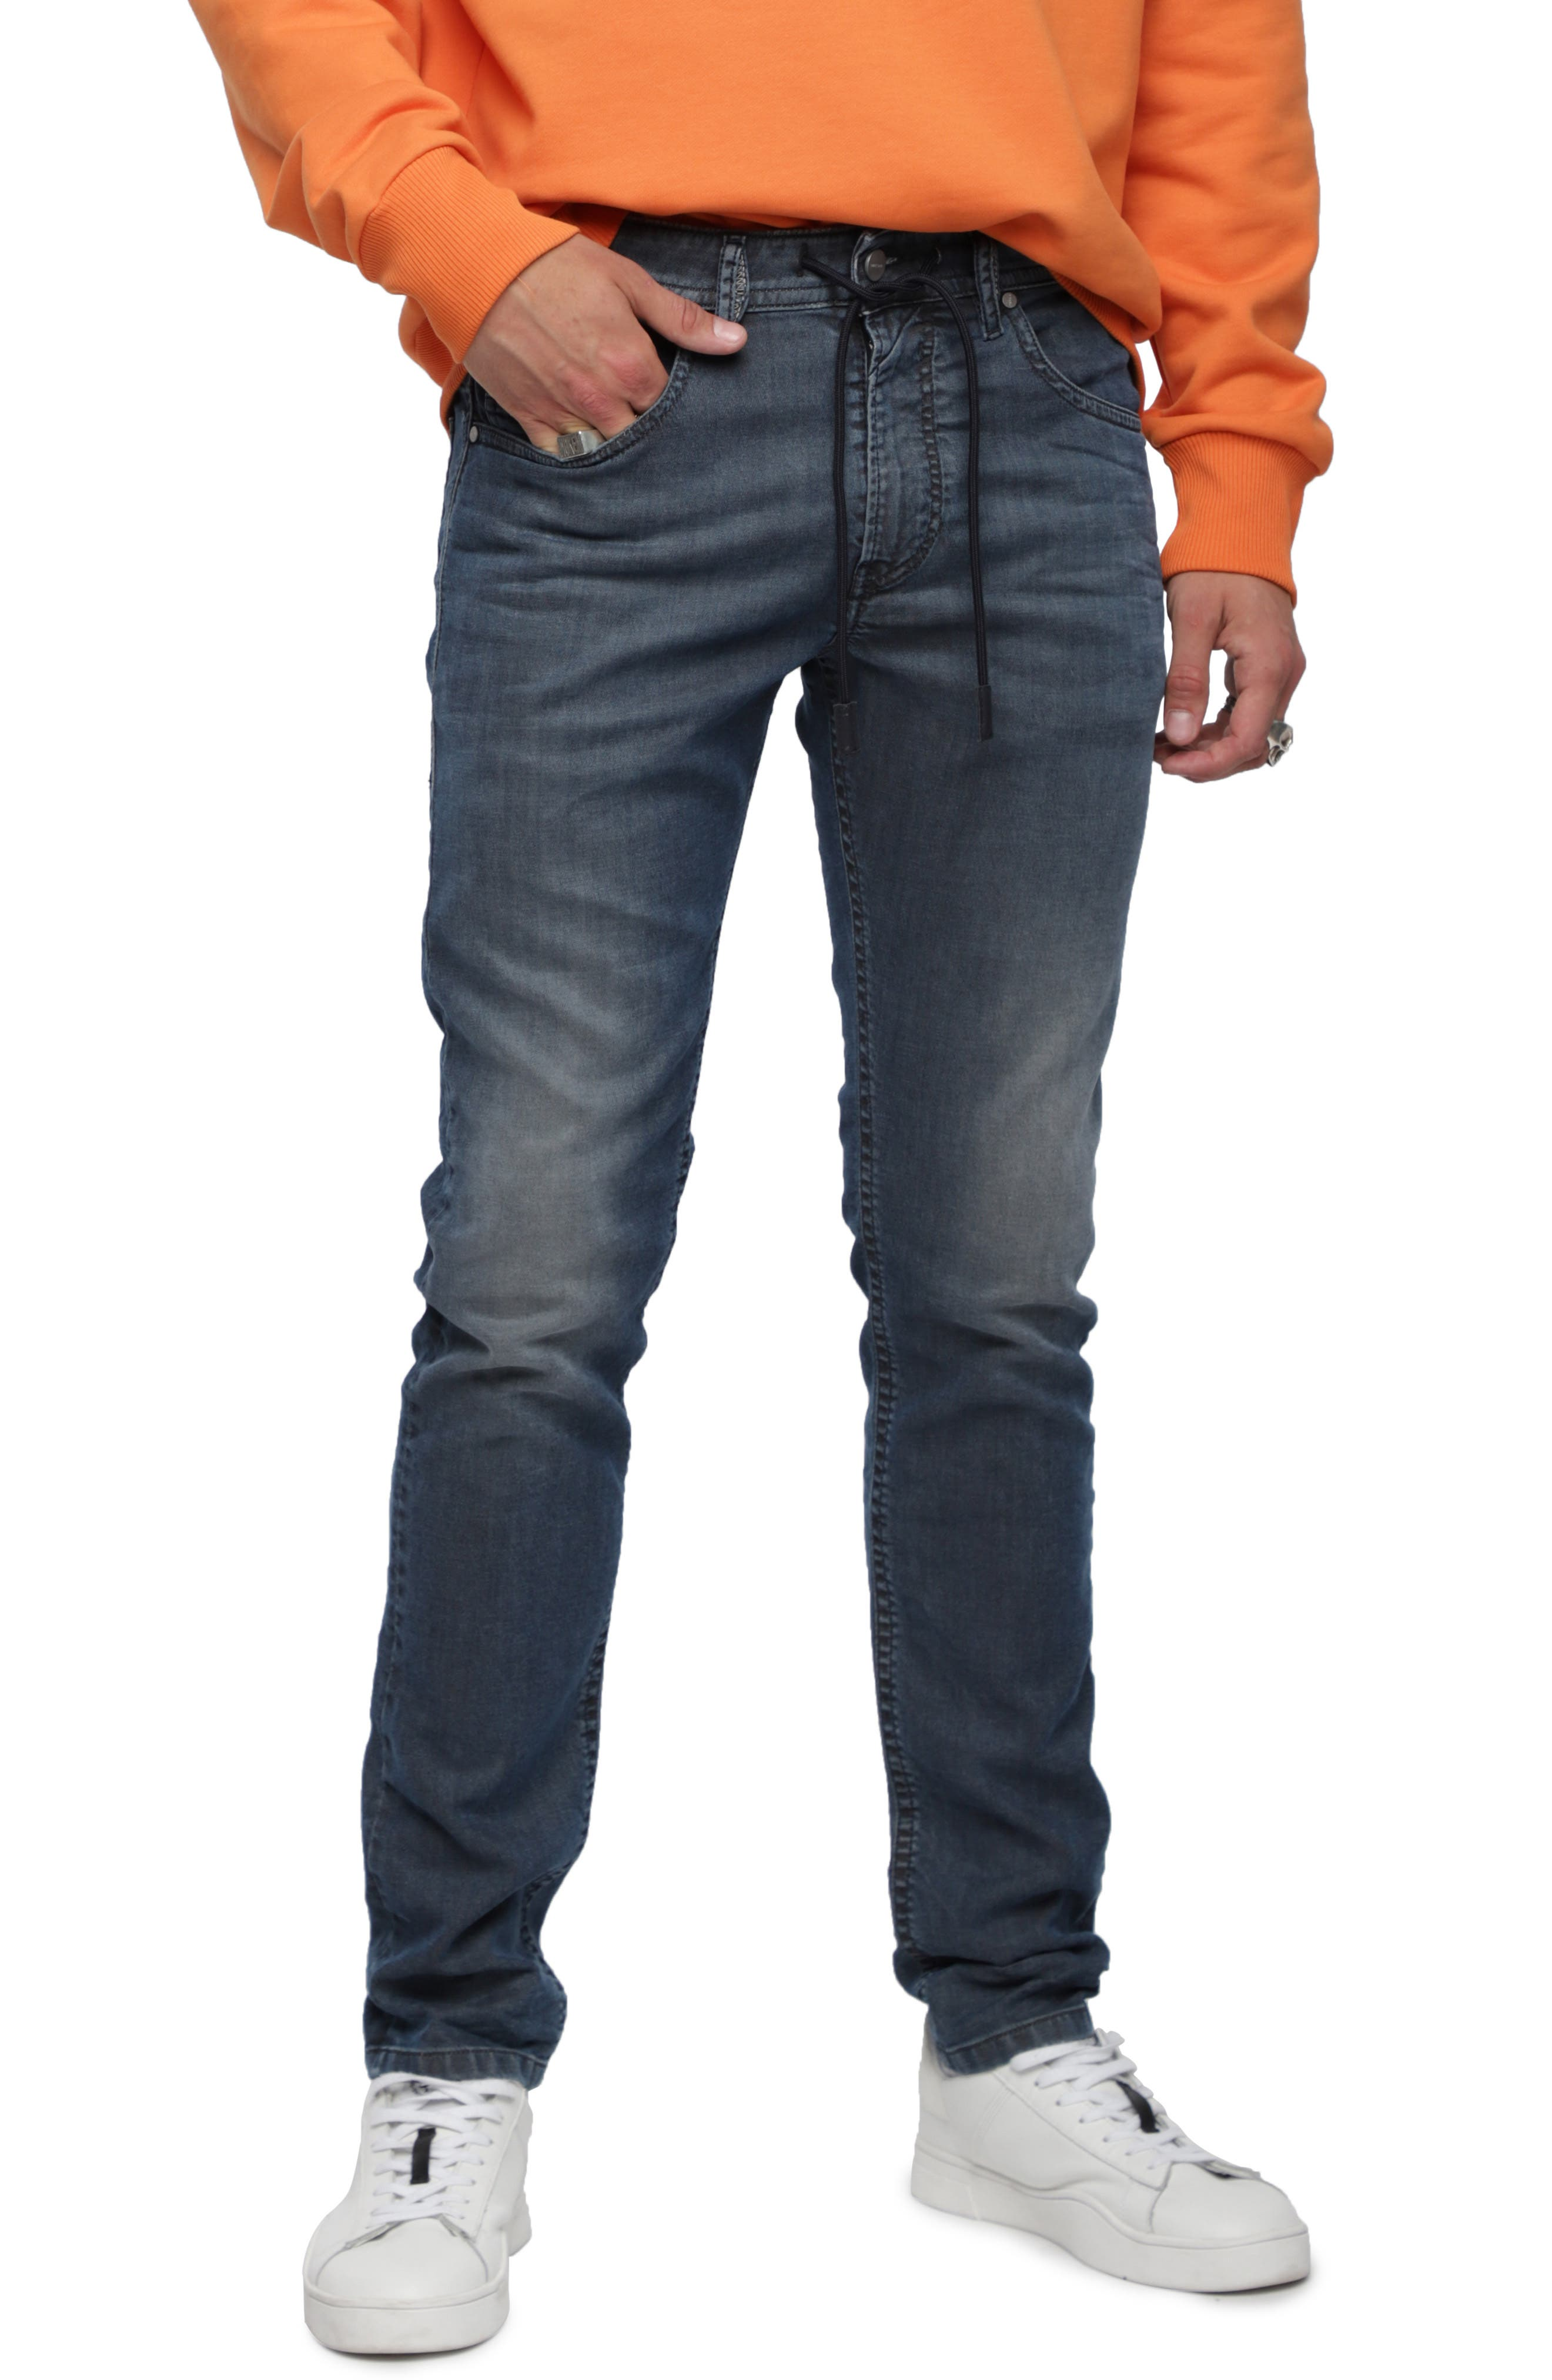 Thommer Slim Fit Jeans,                             Main thumbnail 1, color,                             084ZJ